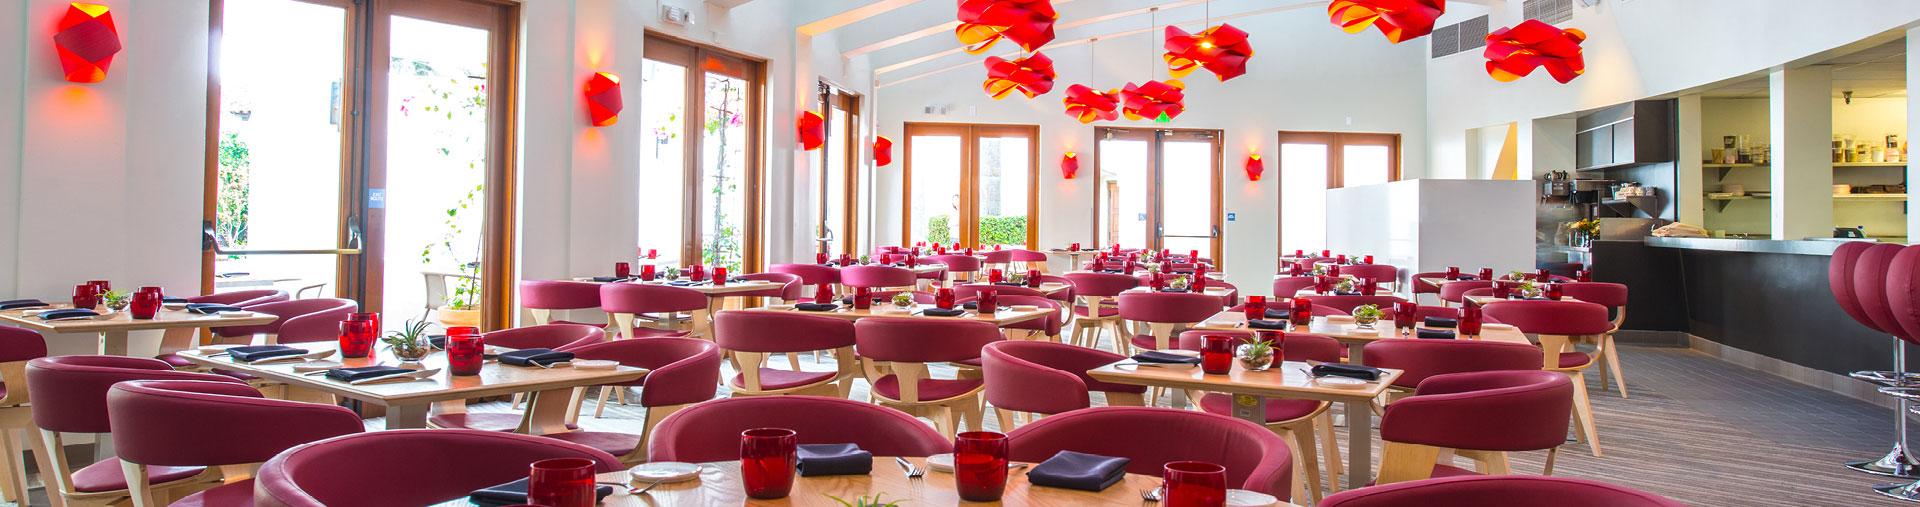 Dining area inside Tangata Restaurant in Orange County